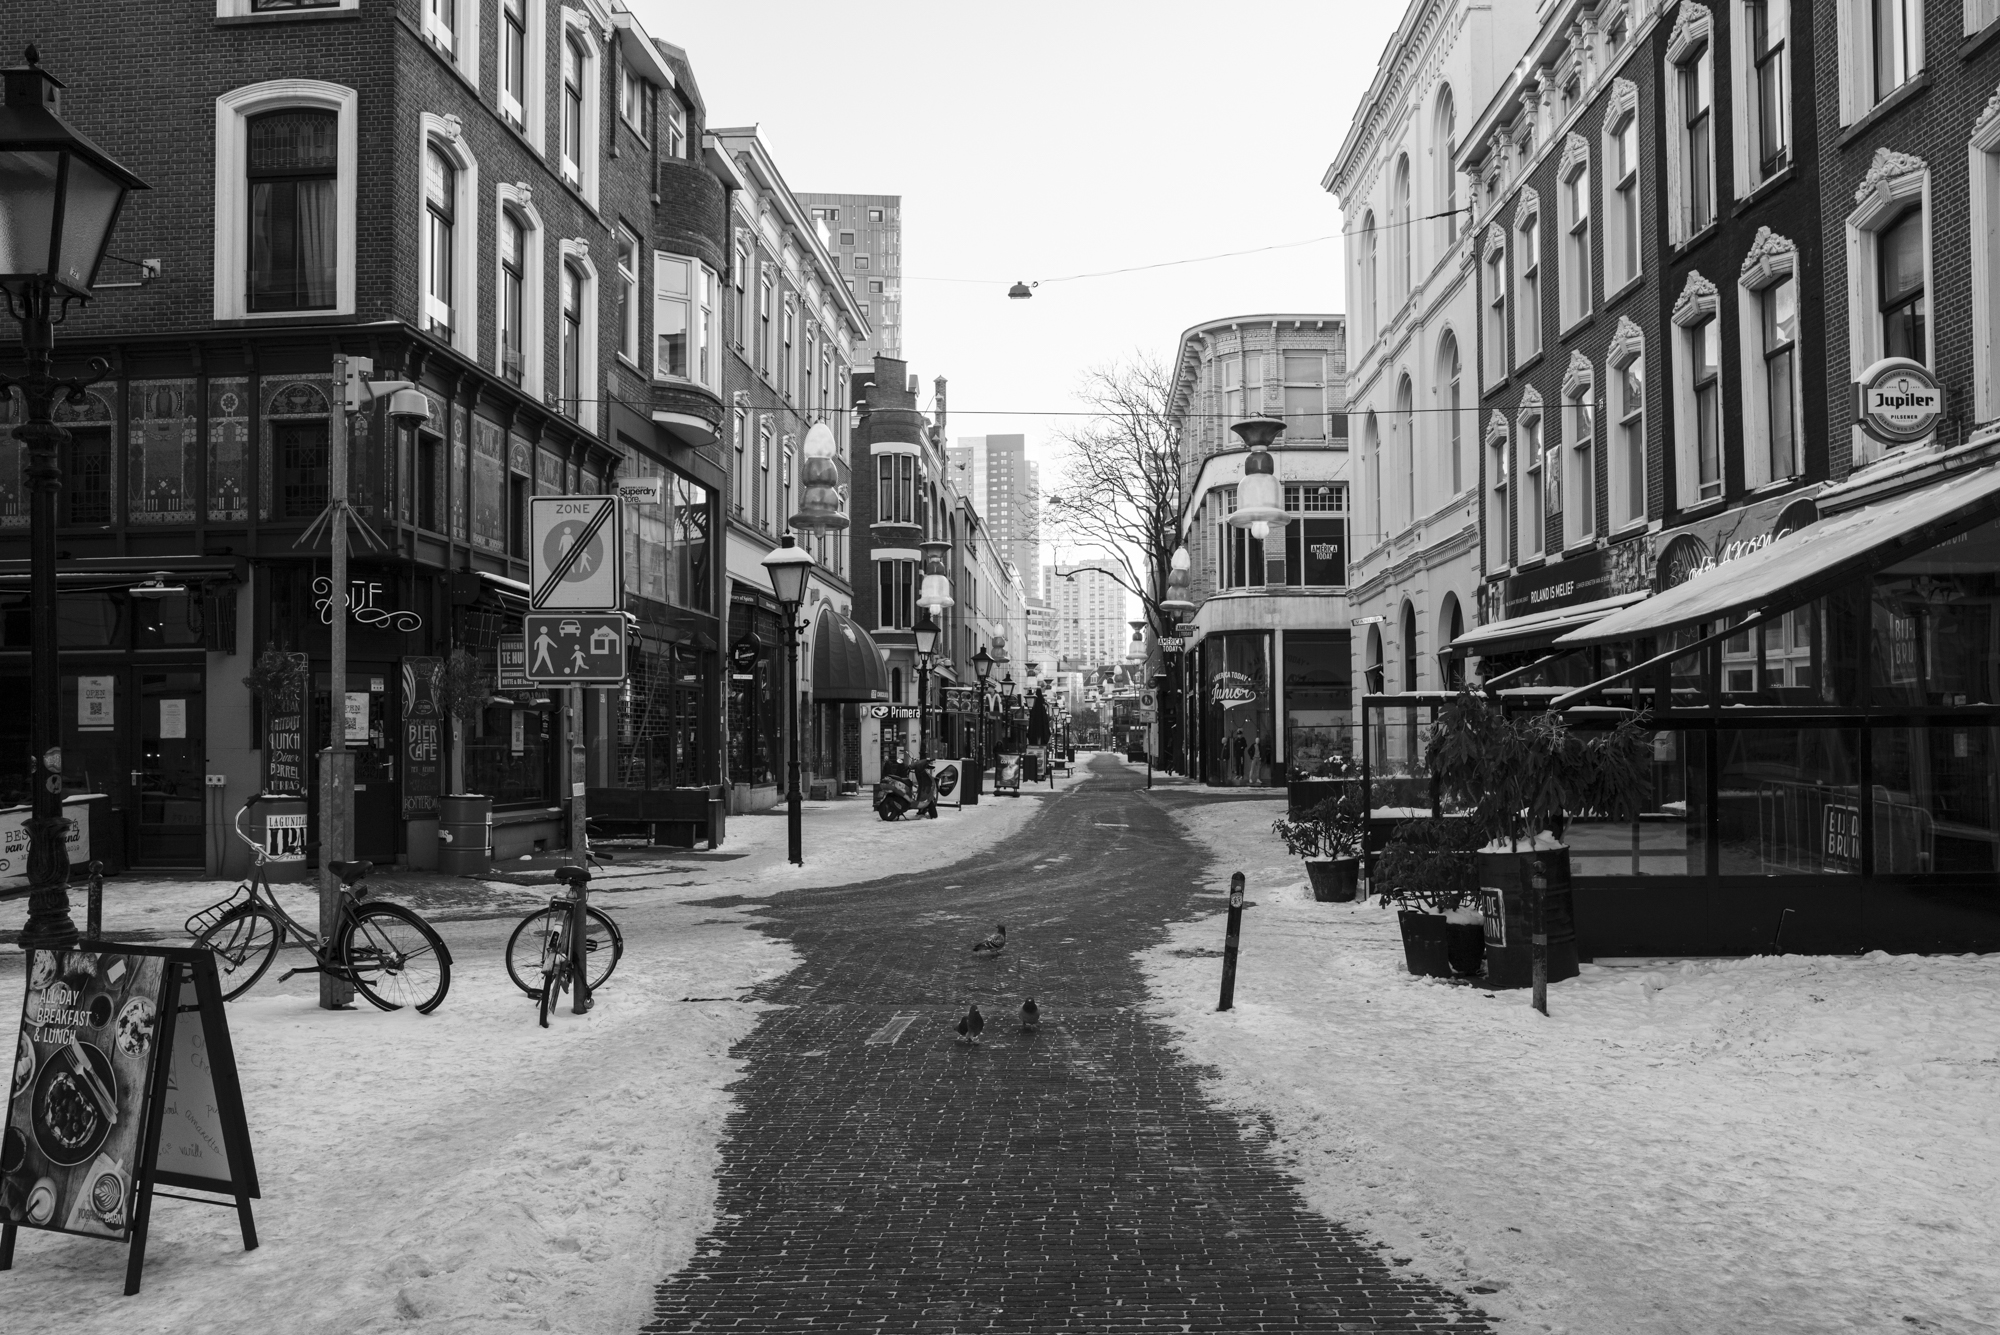 © Peter Janssen (The Netherlands) | Silence has taken over